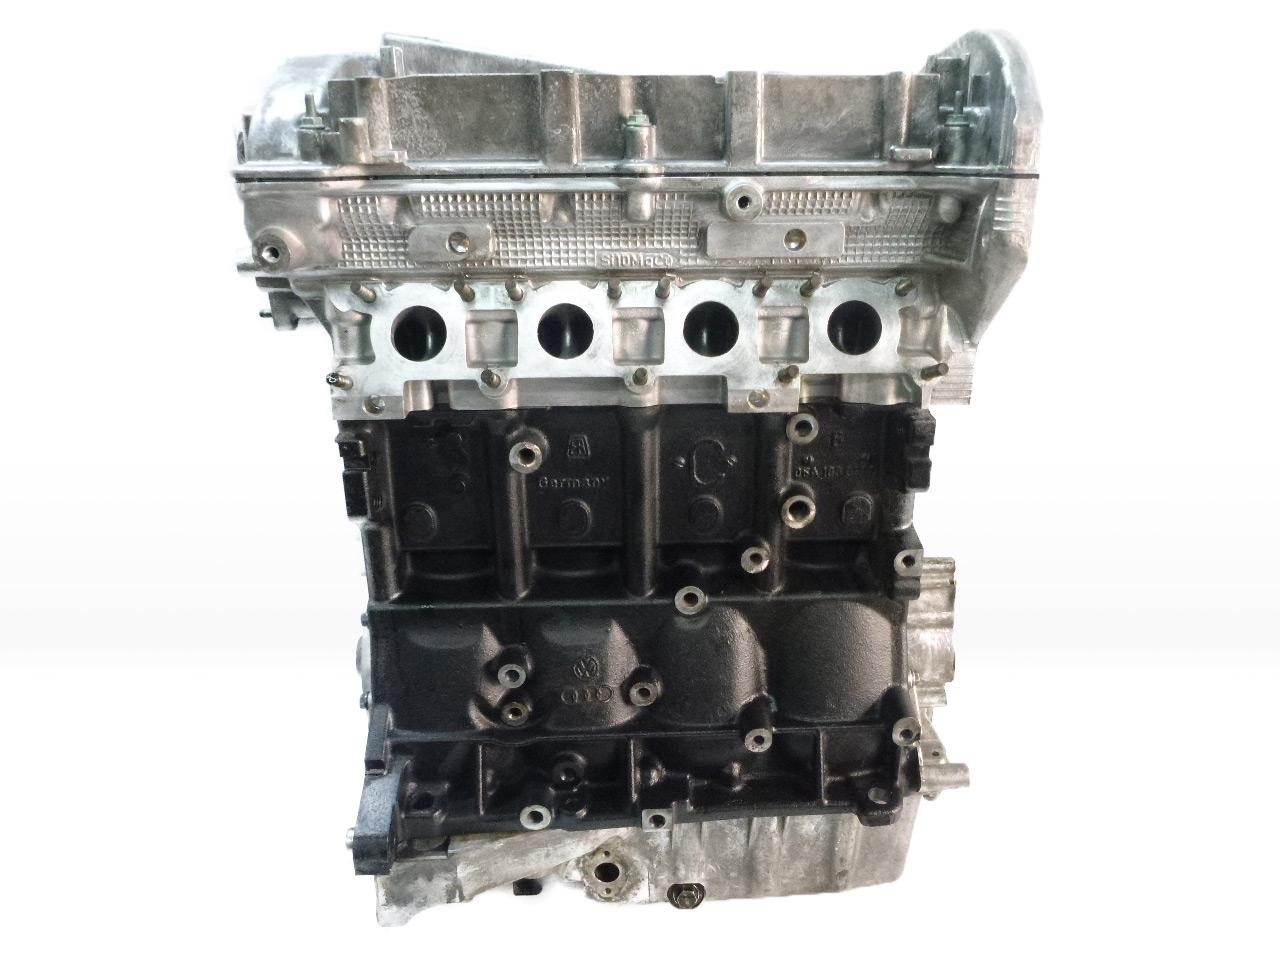 Motor Überholung Instandsetzung Reparatur Audi Seat Skoda VW 1,8 T AGN AGU AJQ